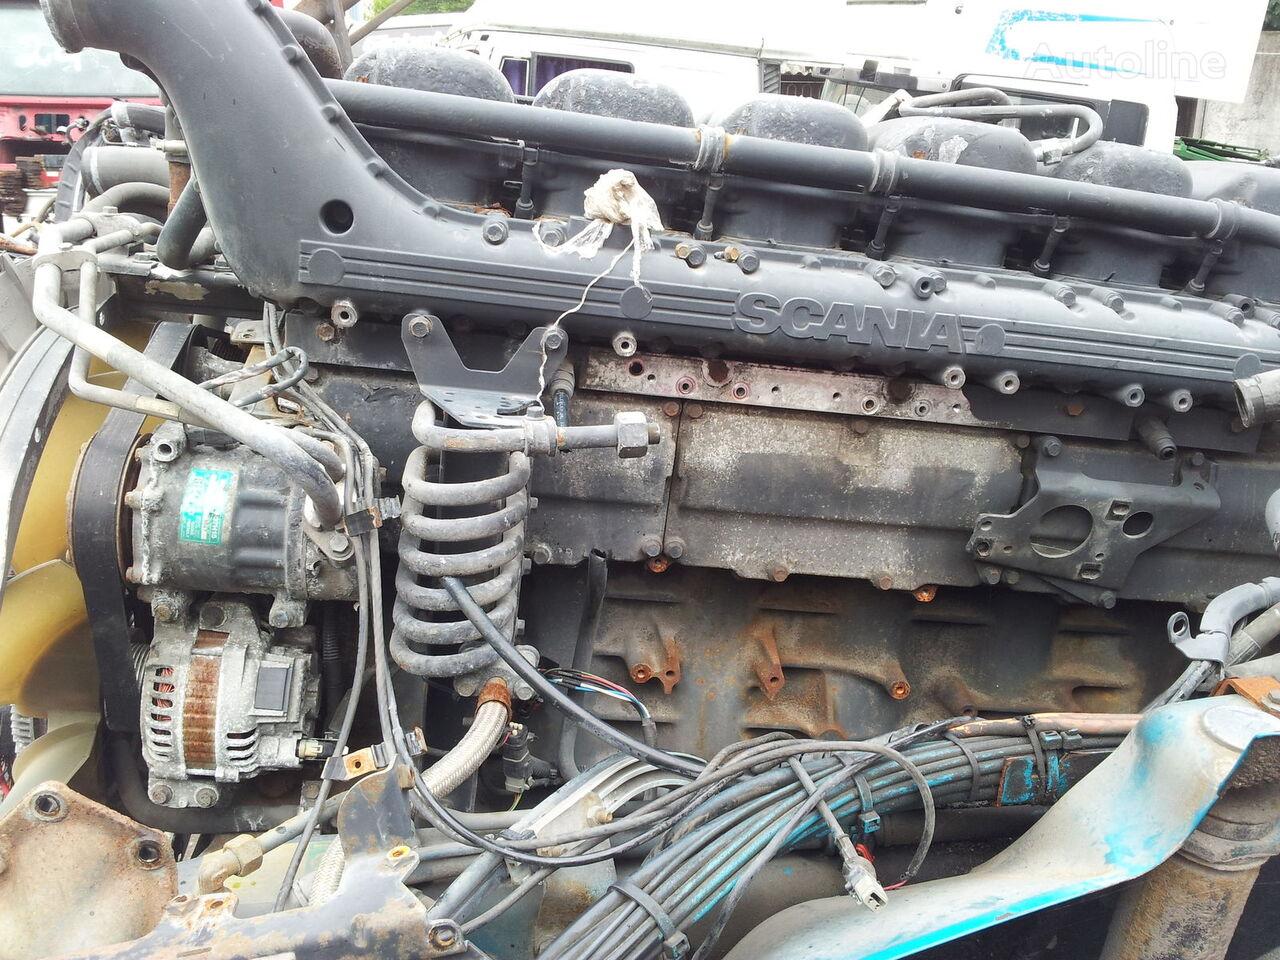 двигатель SCANIA 4 series engine 164C, 164G, 164L, P580, R580, DC1601, 580 PS, v8 для тягача SCANIA 164C, 164G, 164L, P580, R580, DC1601